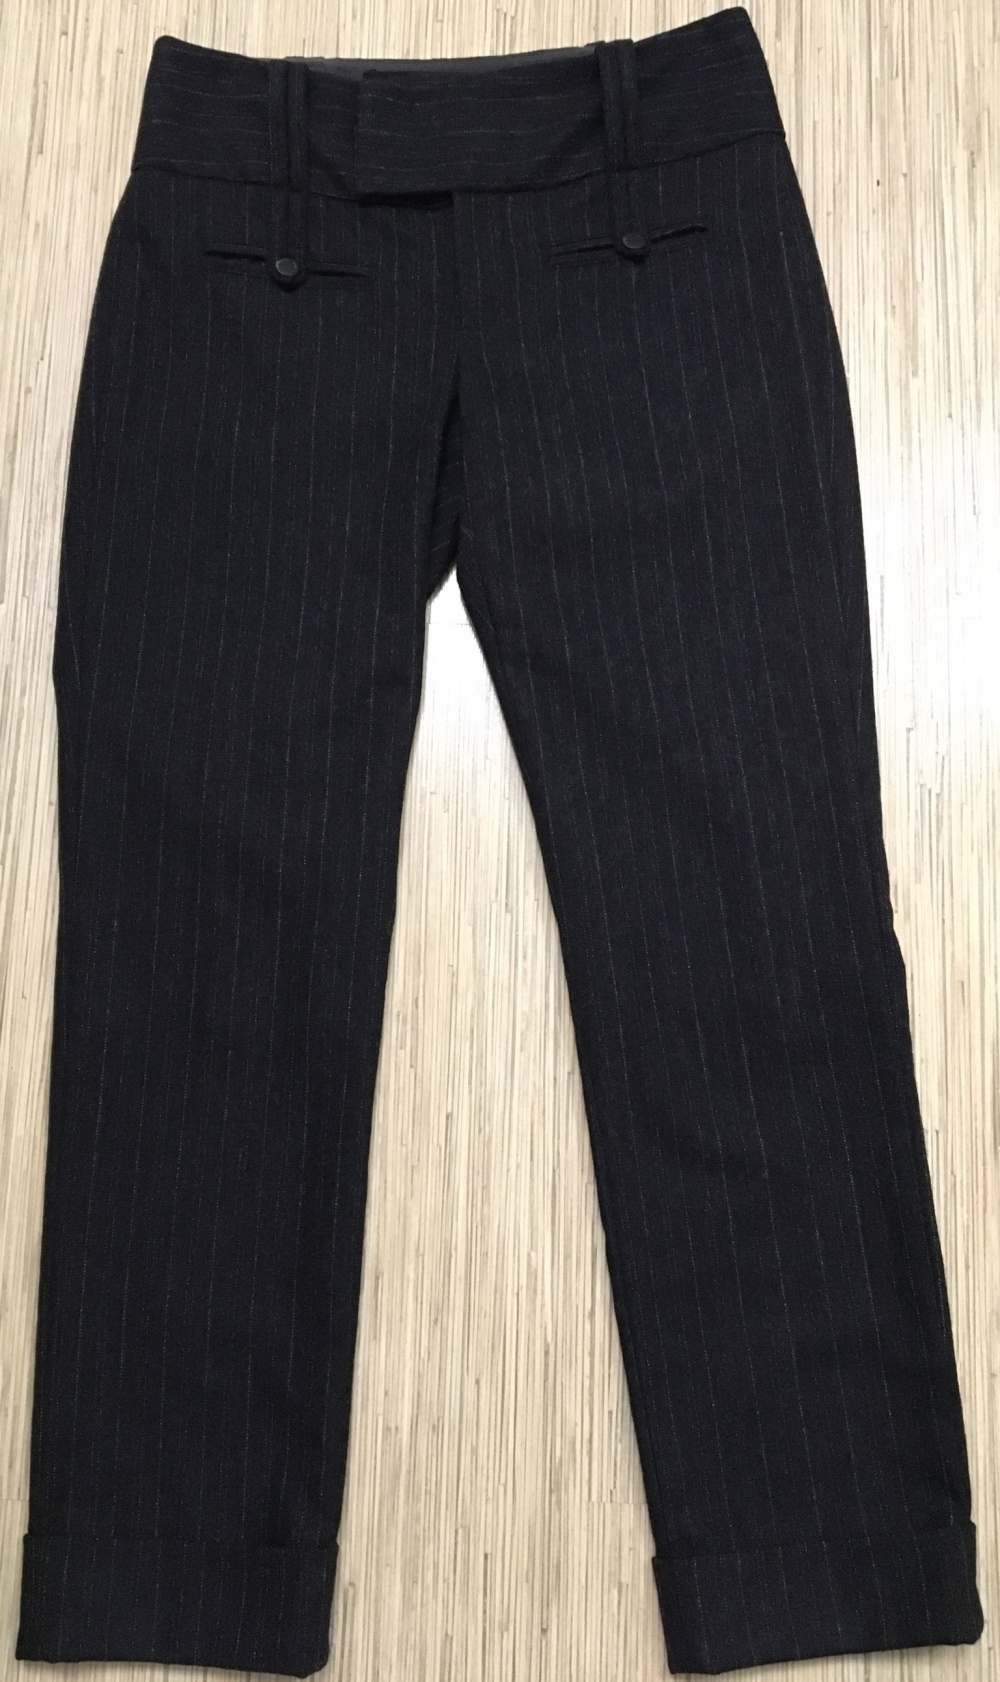 Брюки Brebis Noir, размер S